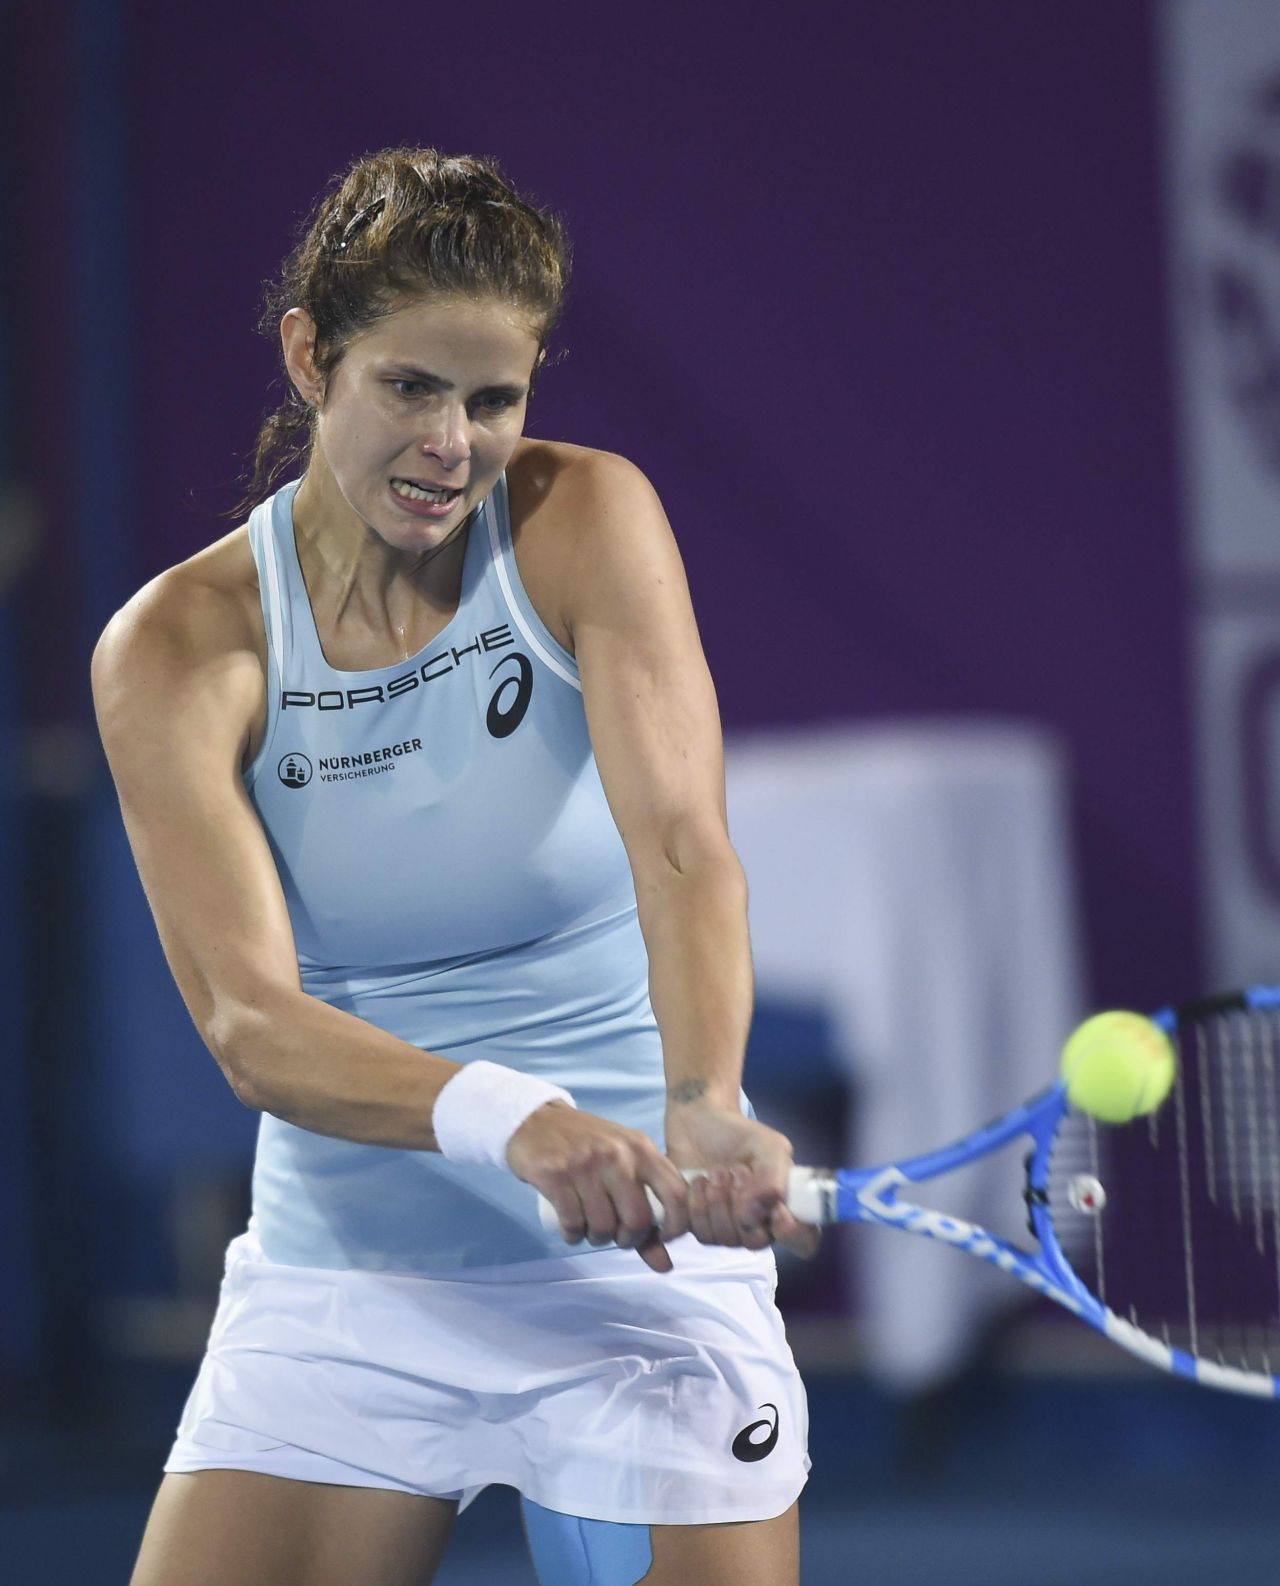 Wta: Qatar WTA Total Open In Doha 02/16/2018